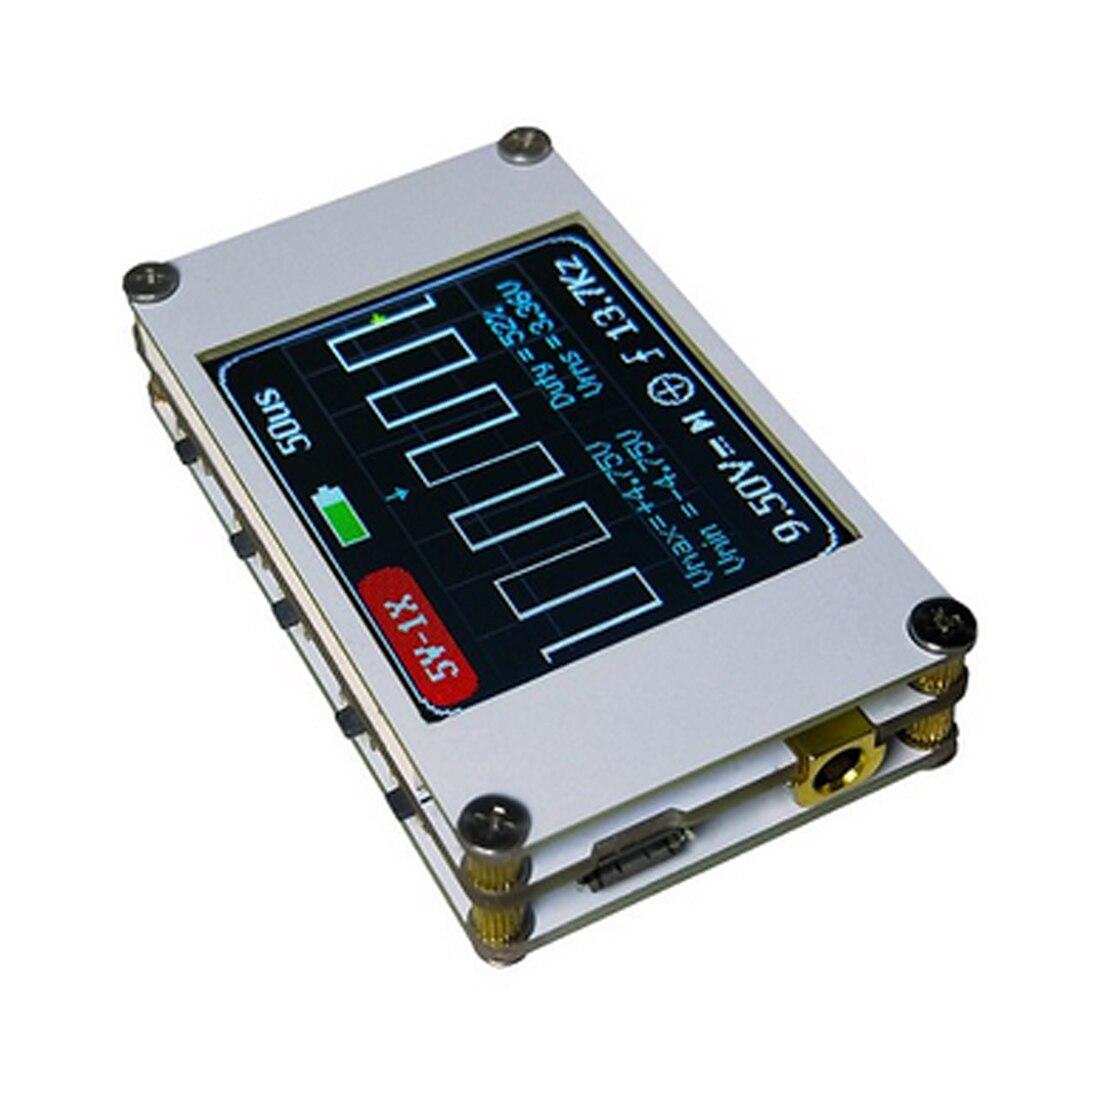 цена на 1M Bandwidth 5M Sample Rate Digital Oscilloscope Kit Mini Pocket Portable Ultra-small Digital Oscilloscope Handheld